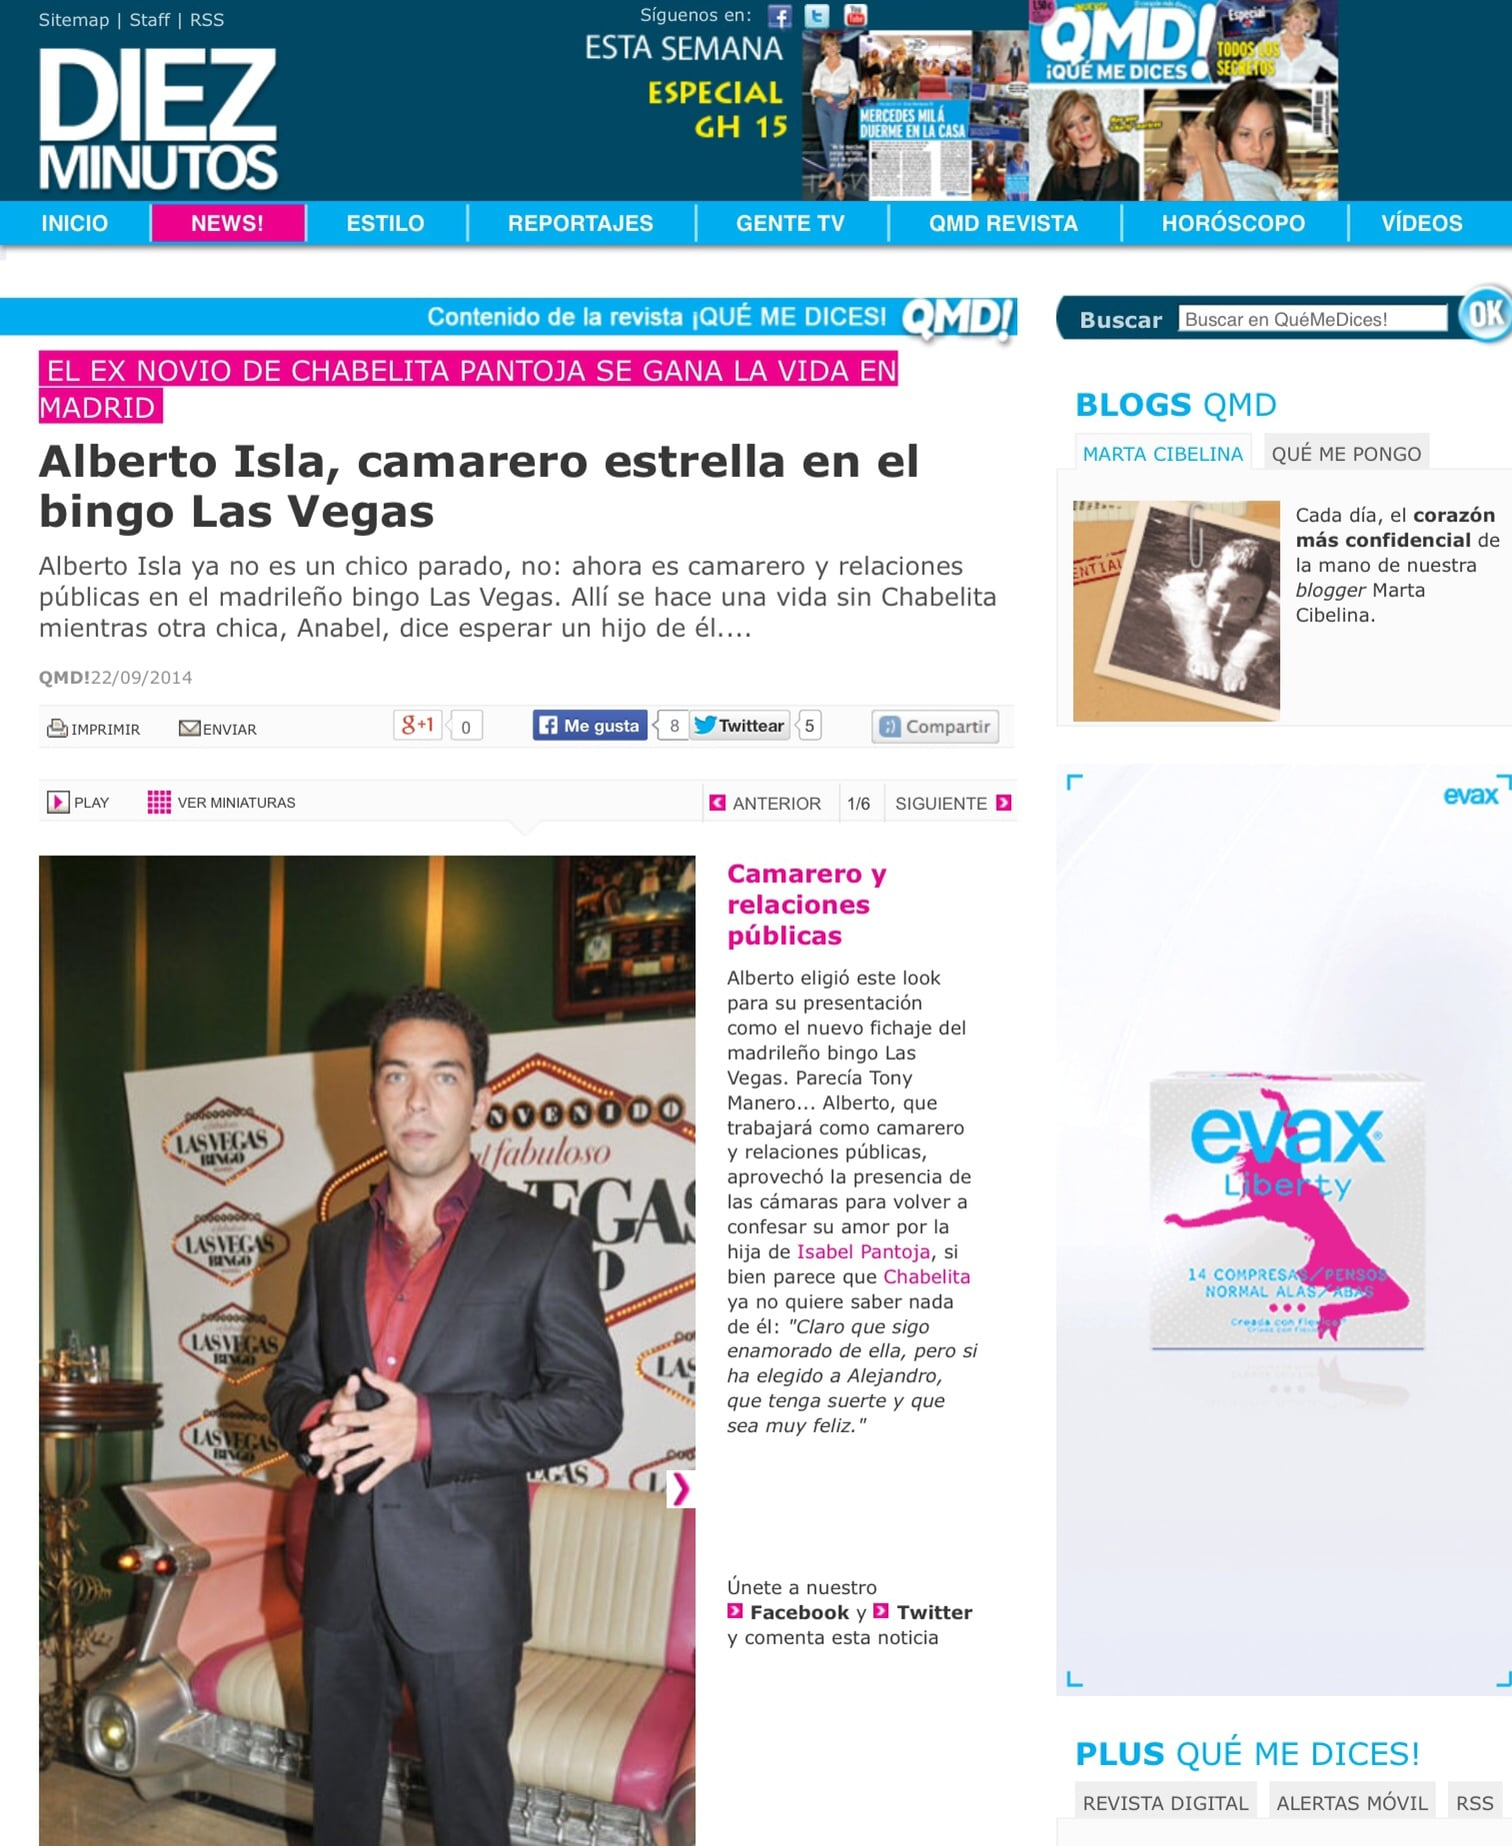 Alberto Isla, camarero estrella en el Bingo Las Vegas